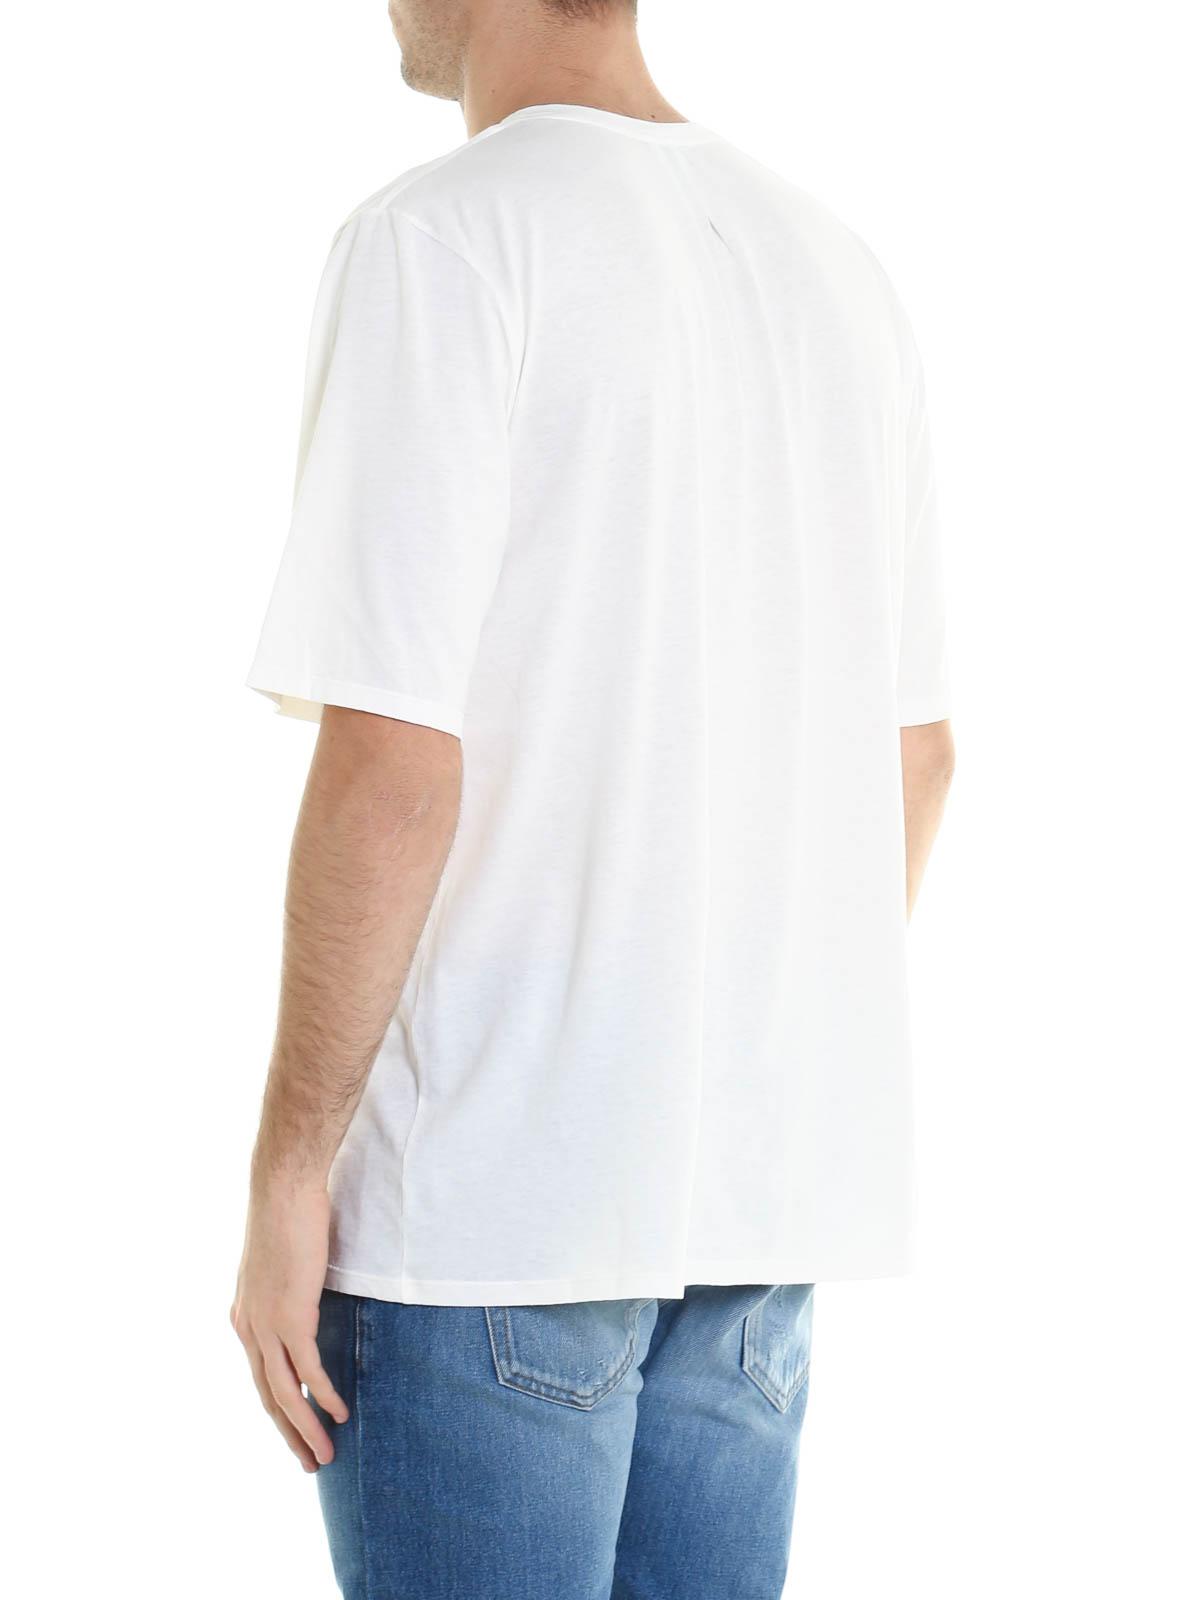 Snake print jersey t shirt by saint laurent t shirts ikrix for Saint laurent t shirt